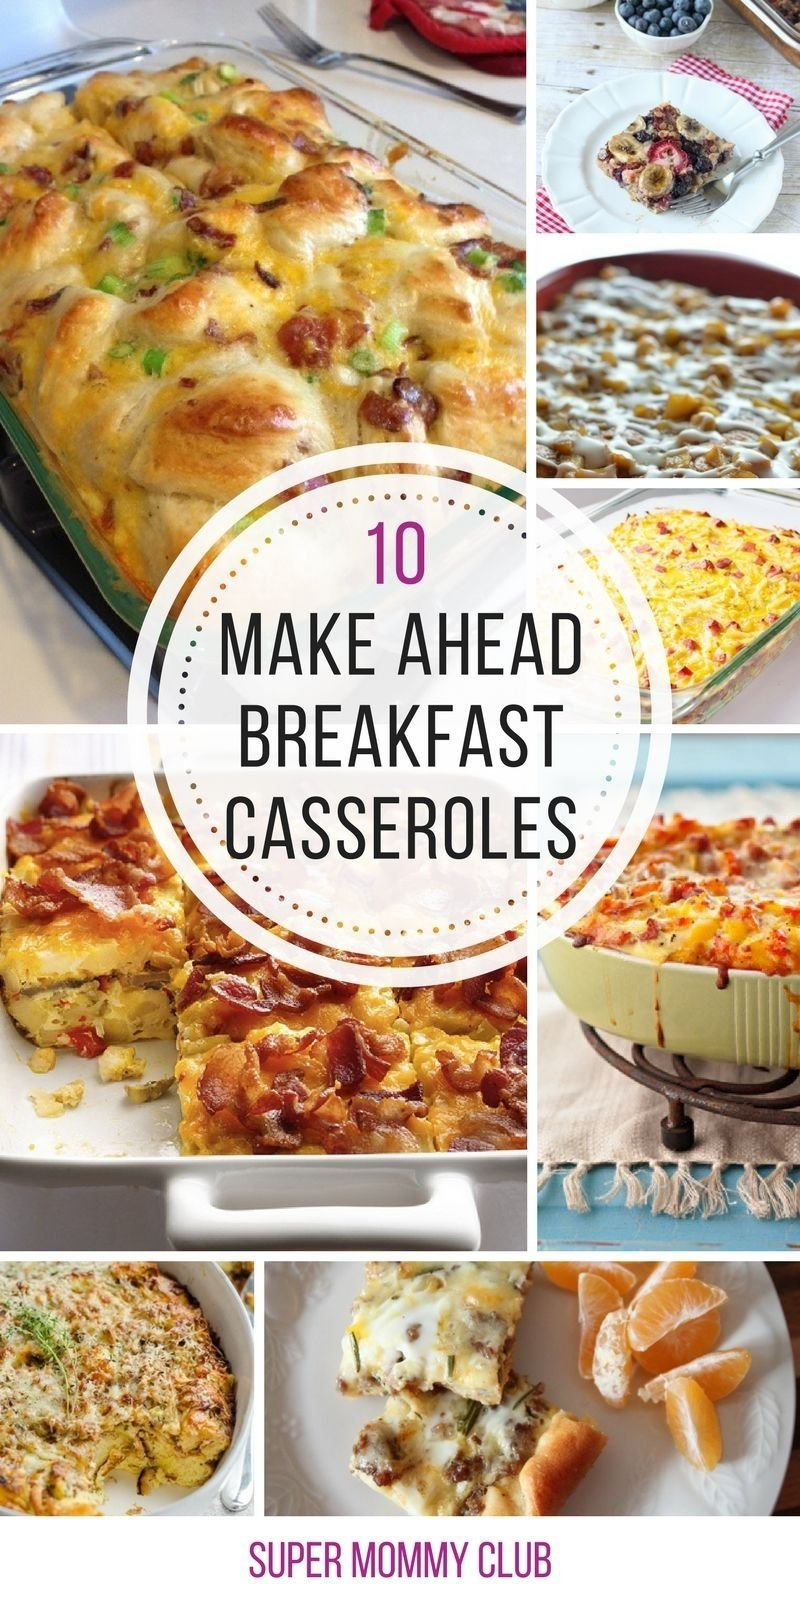 10 Stunning Breakfast Ideas For A Crowd 10 amazing make ahead breakfast casseroles youll wish youd tried 2020